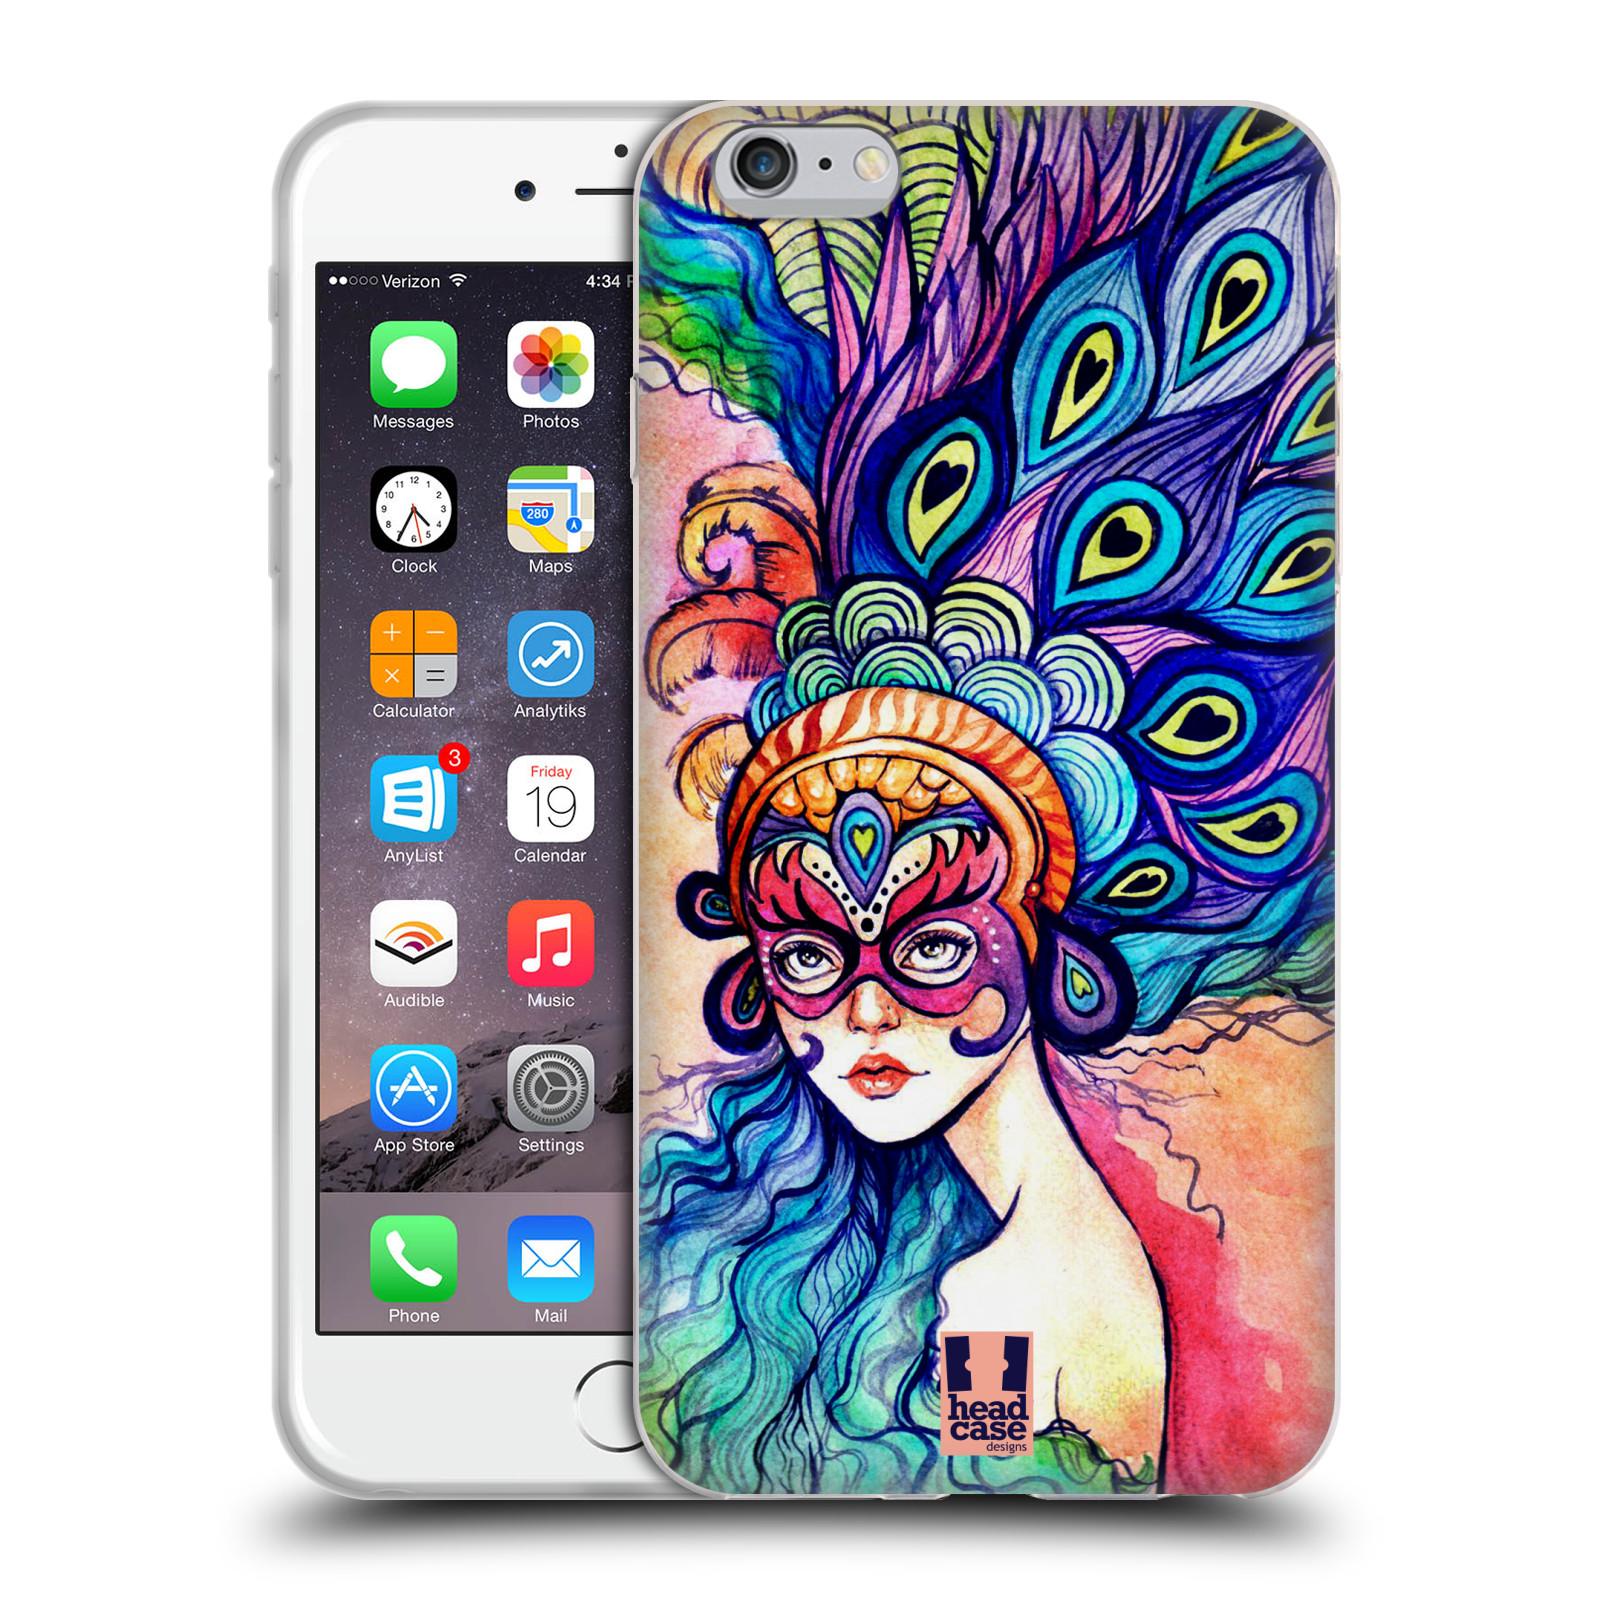 HEAD CASE silikonový obal na mobil Apple Iphone 6 PLUS/ 6S PLUS vzor Maškarní ples masky kreslené vzory MODRÉ PÍRKA